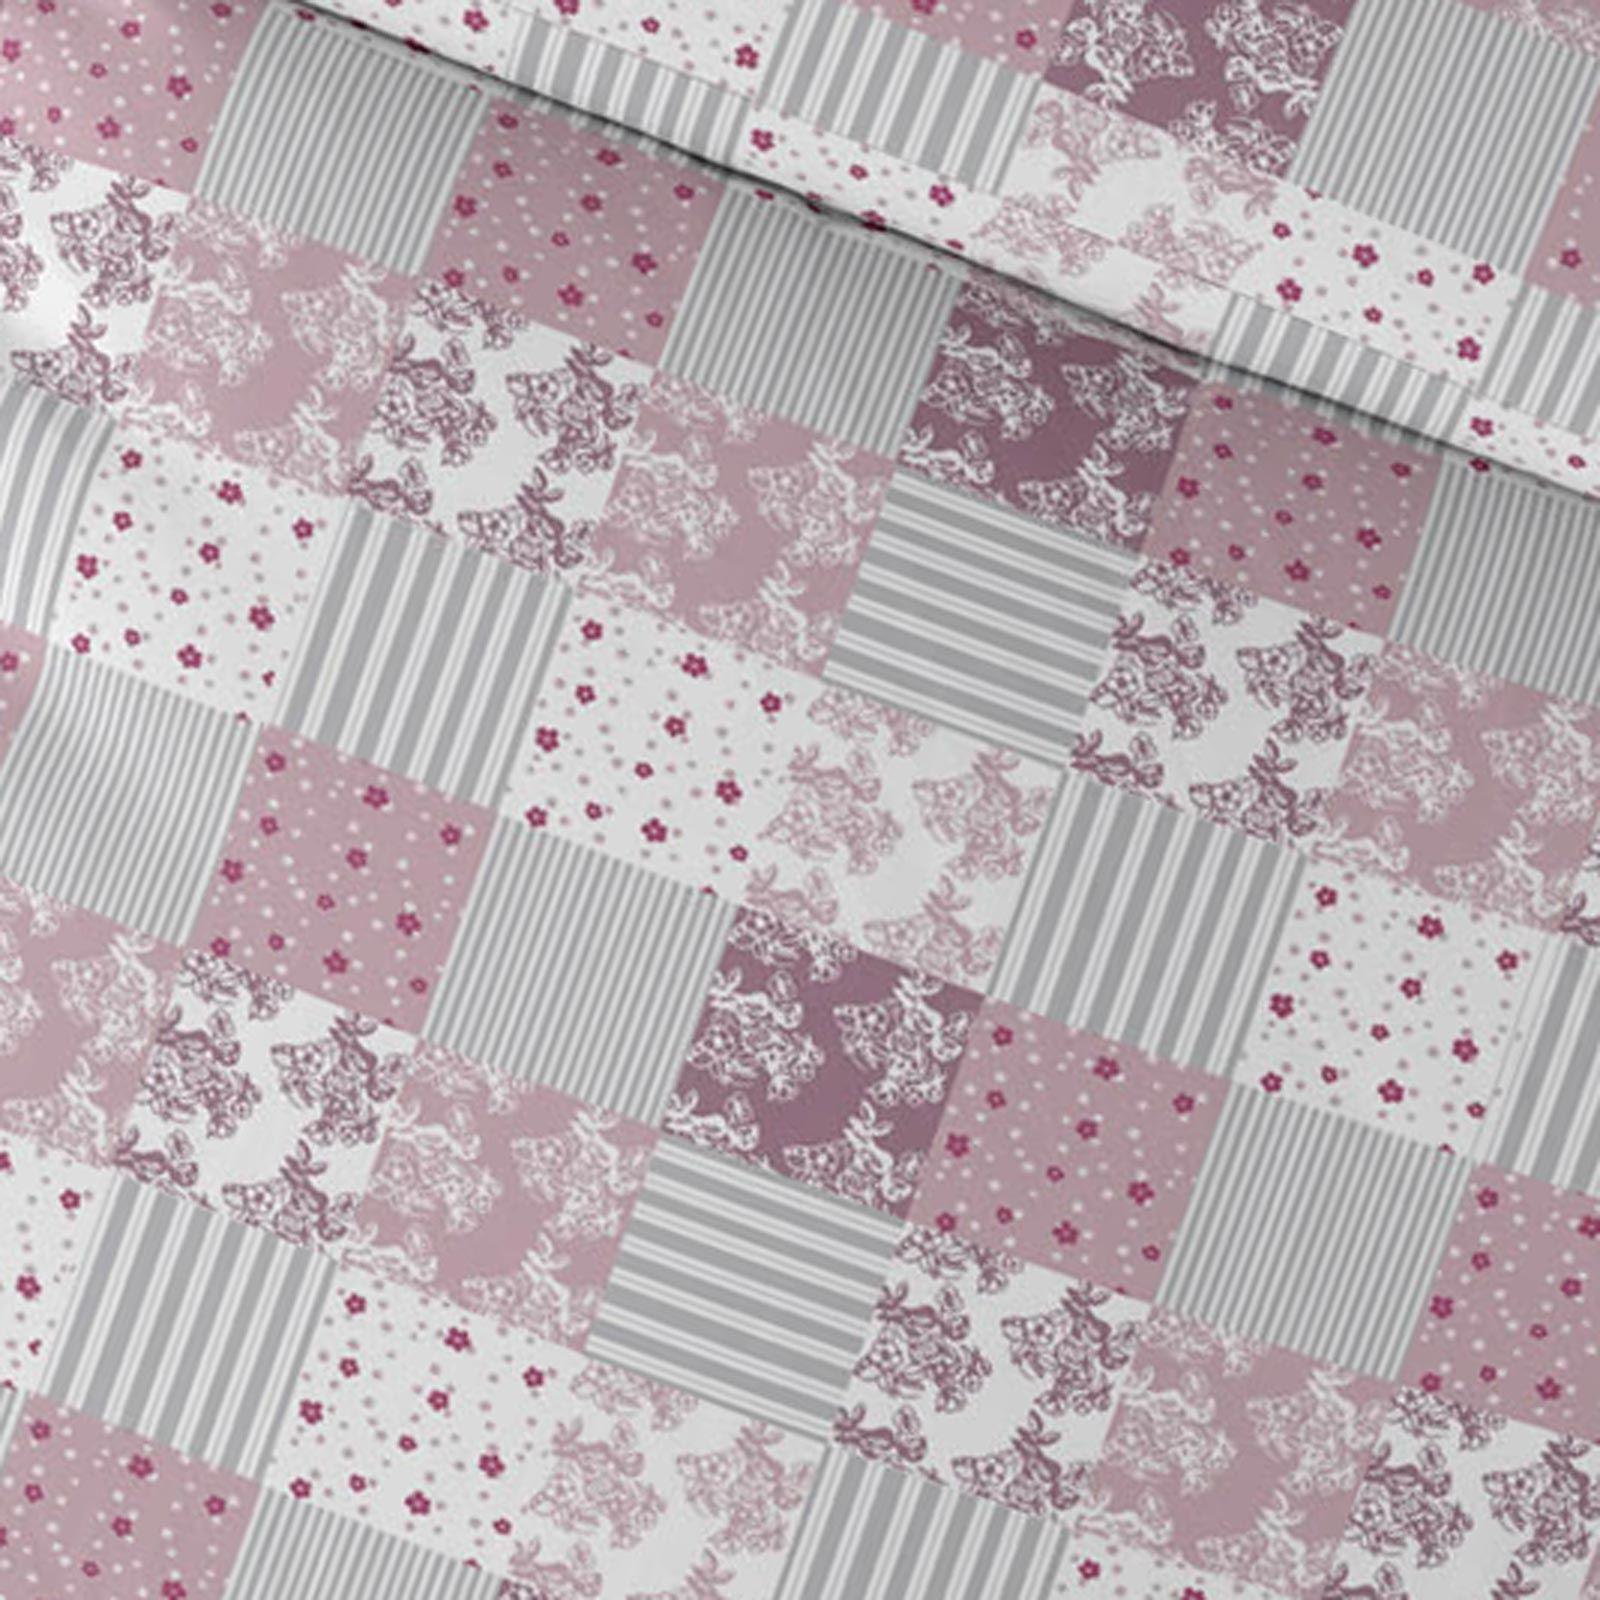 Cubierta-Edredon-Rosa-Blush-Rose-Impreso-juego-De-Edredon-Conjuntos-de-Cama-cubre-Jacquard miniatura 12